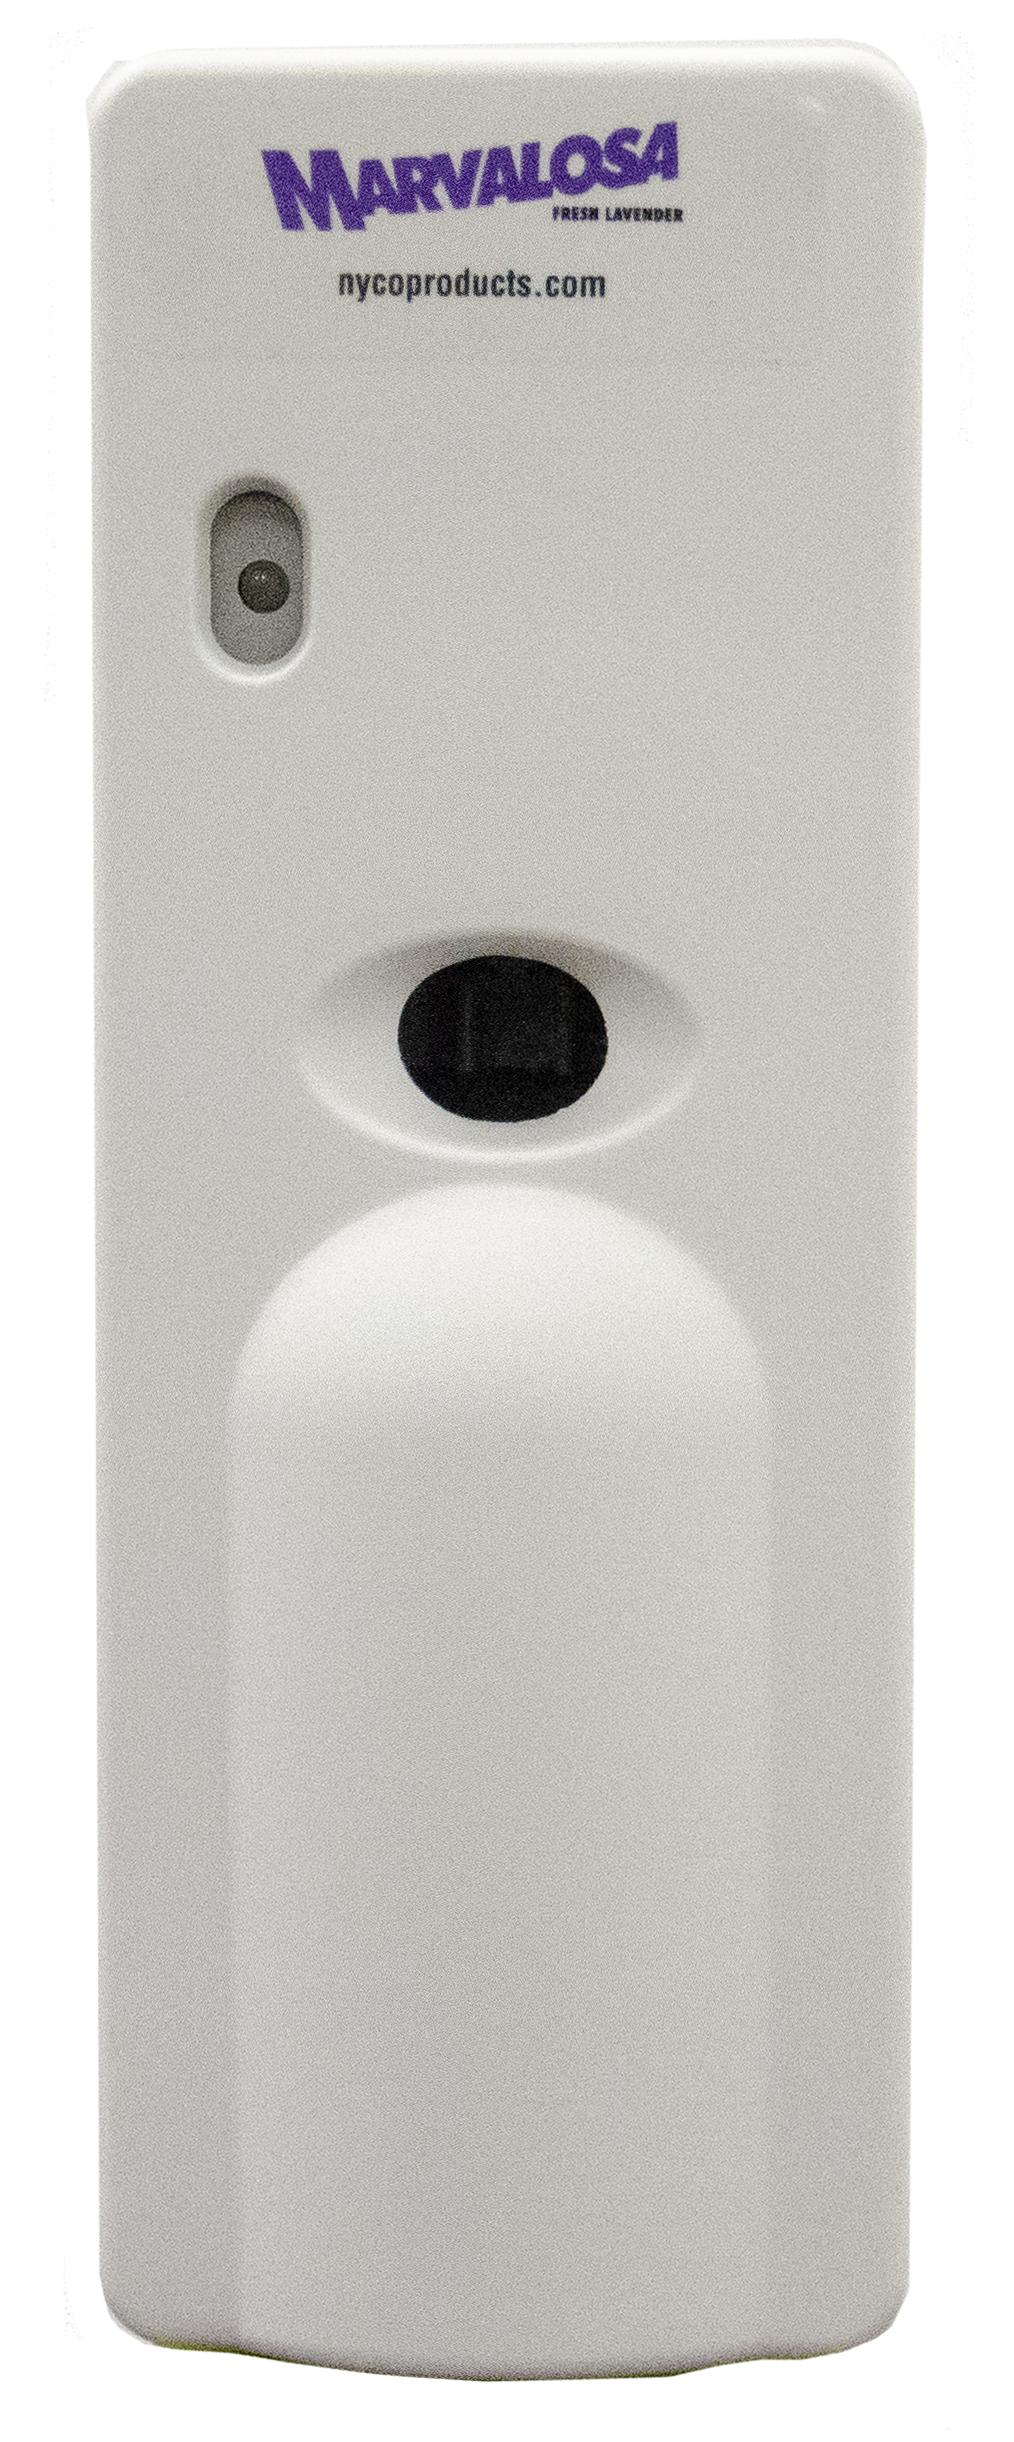 Nyco DSP-A797 7 oz. metered aerosol dispenser